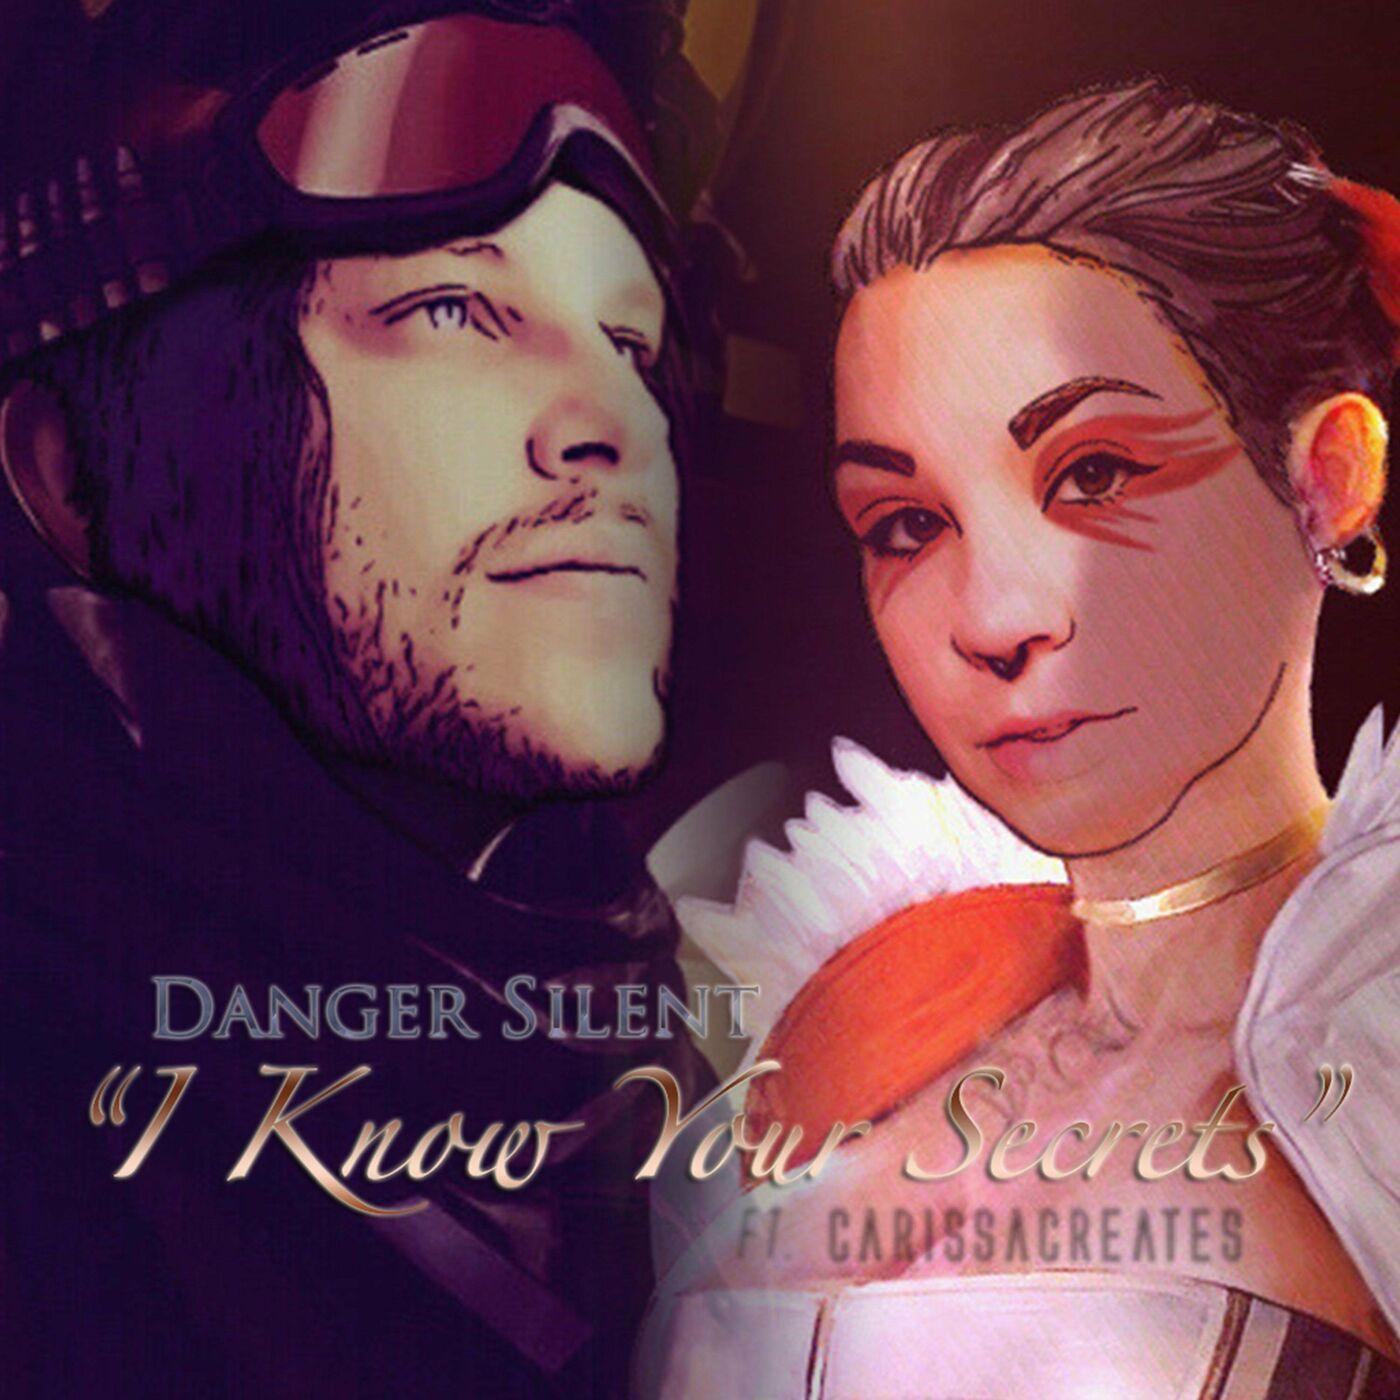 Danger Silent - I Know Your Secrets [single] (2020)